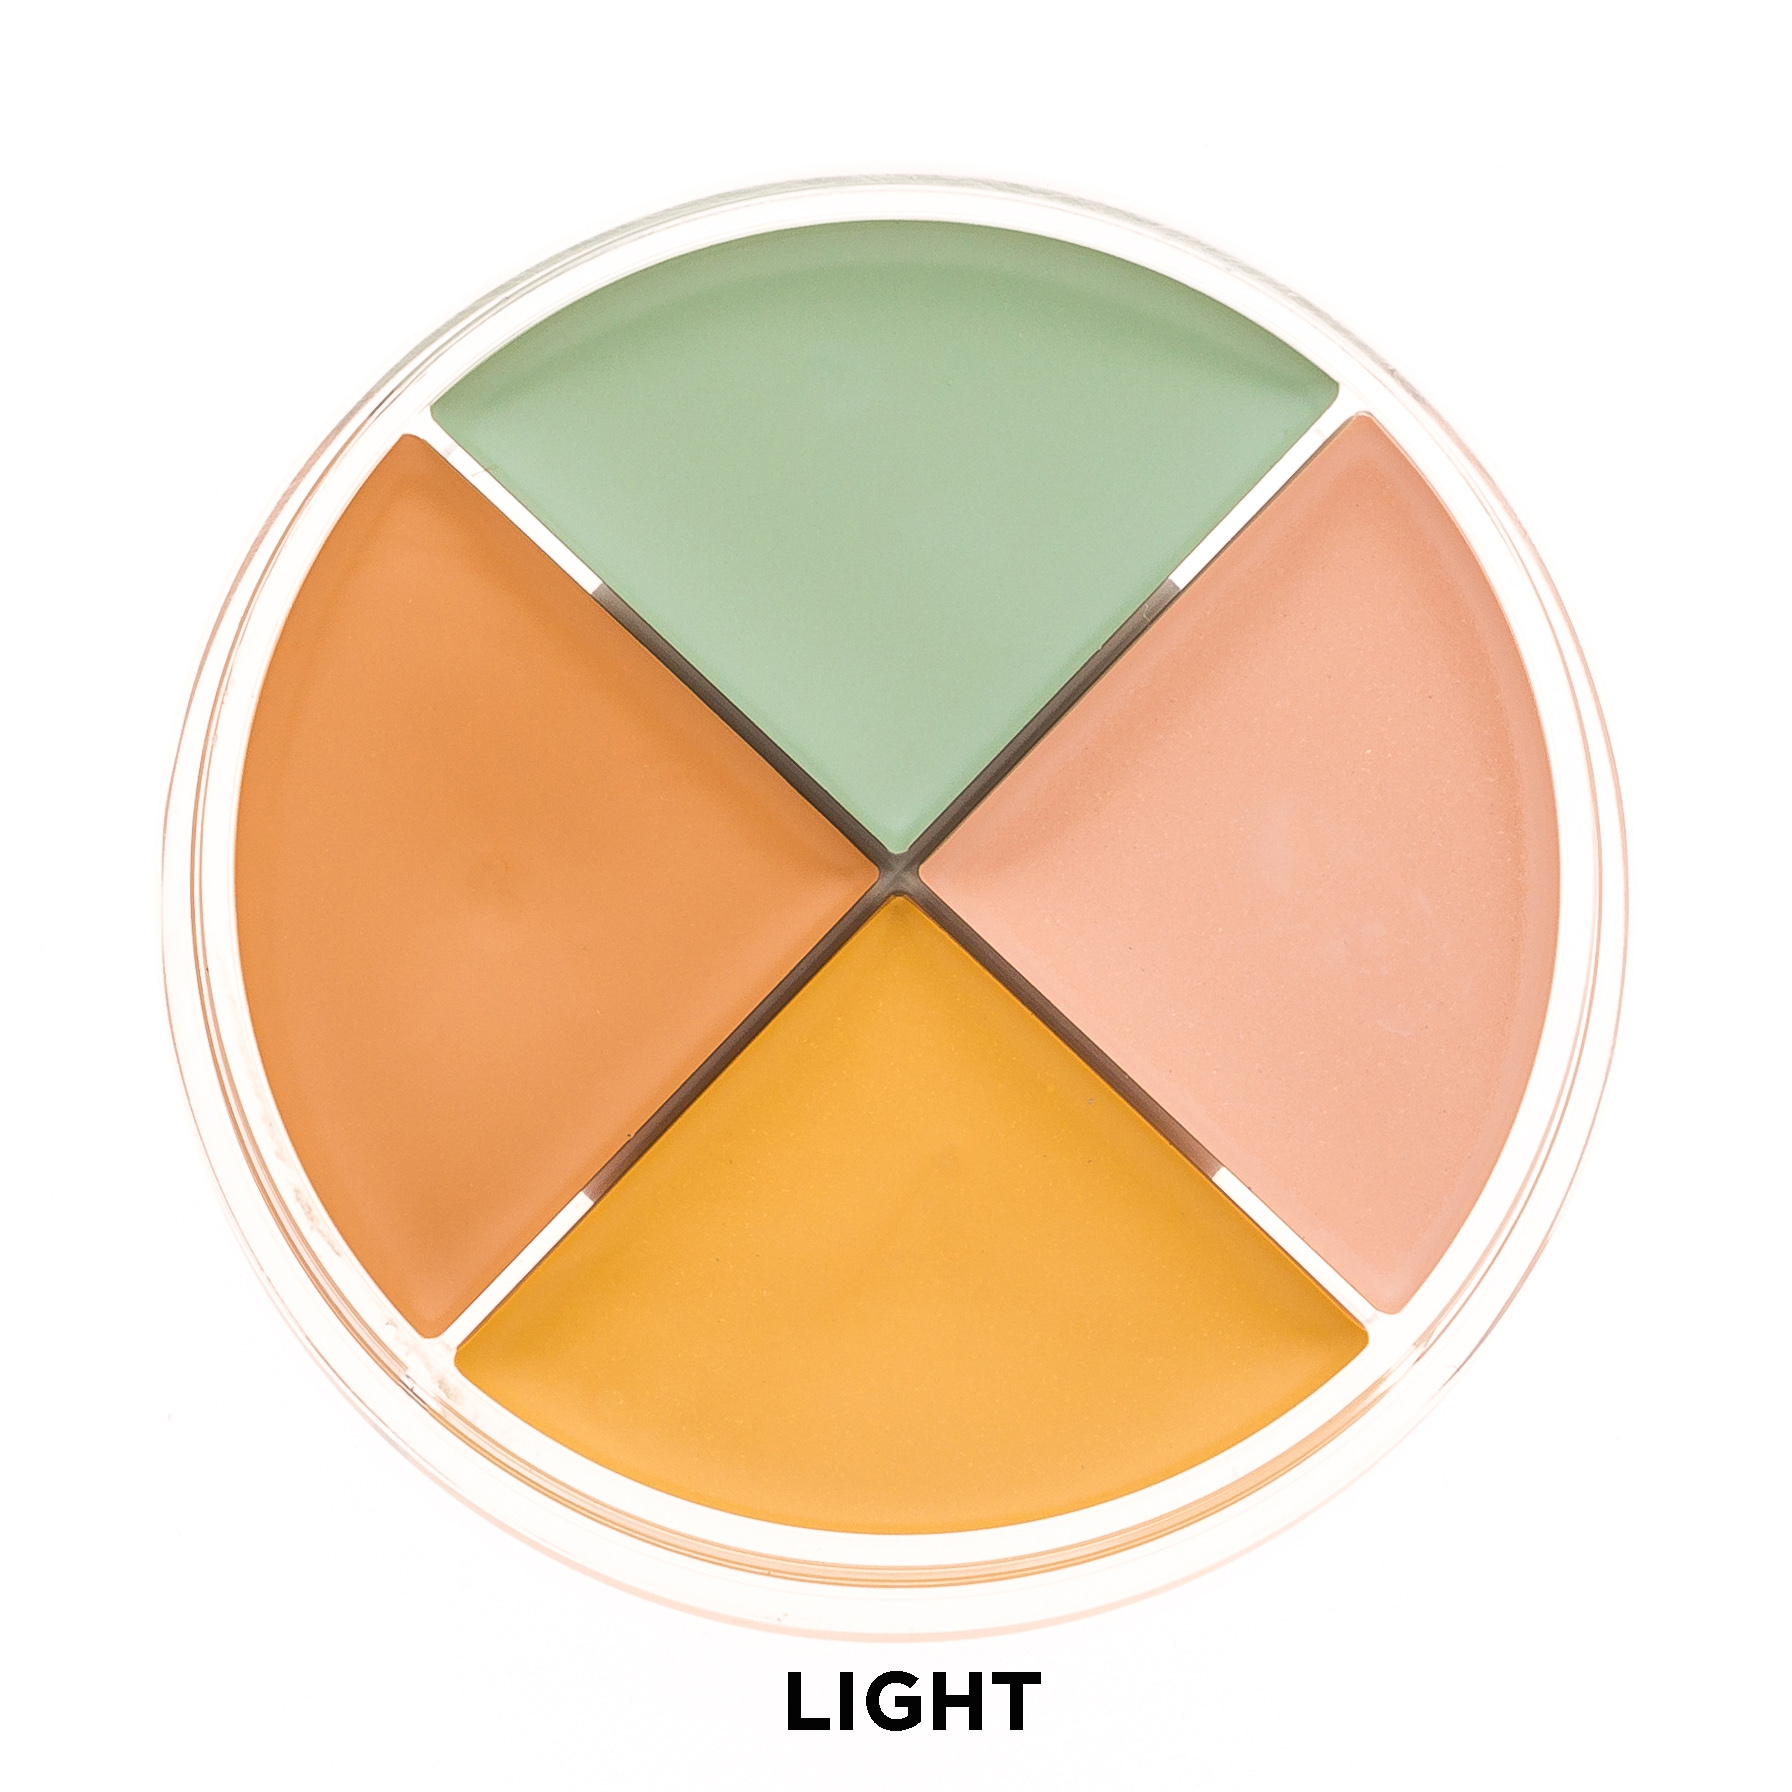 LIGHT-1-TOP copy.jpg